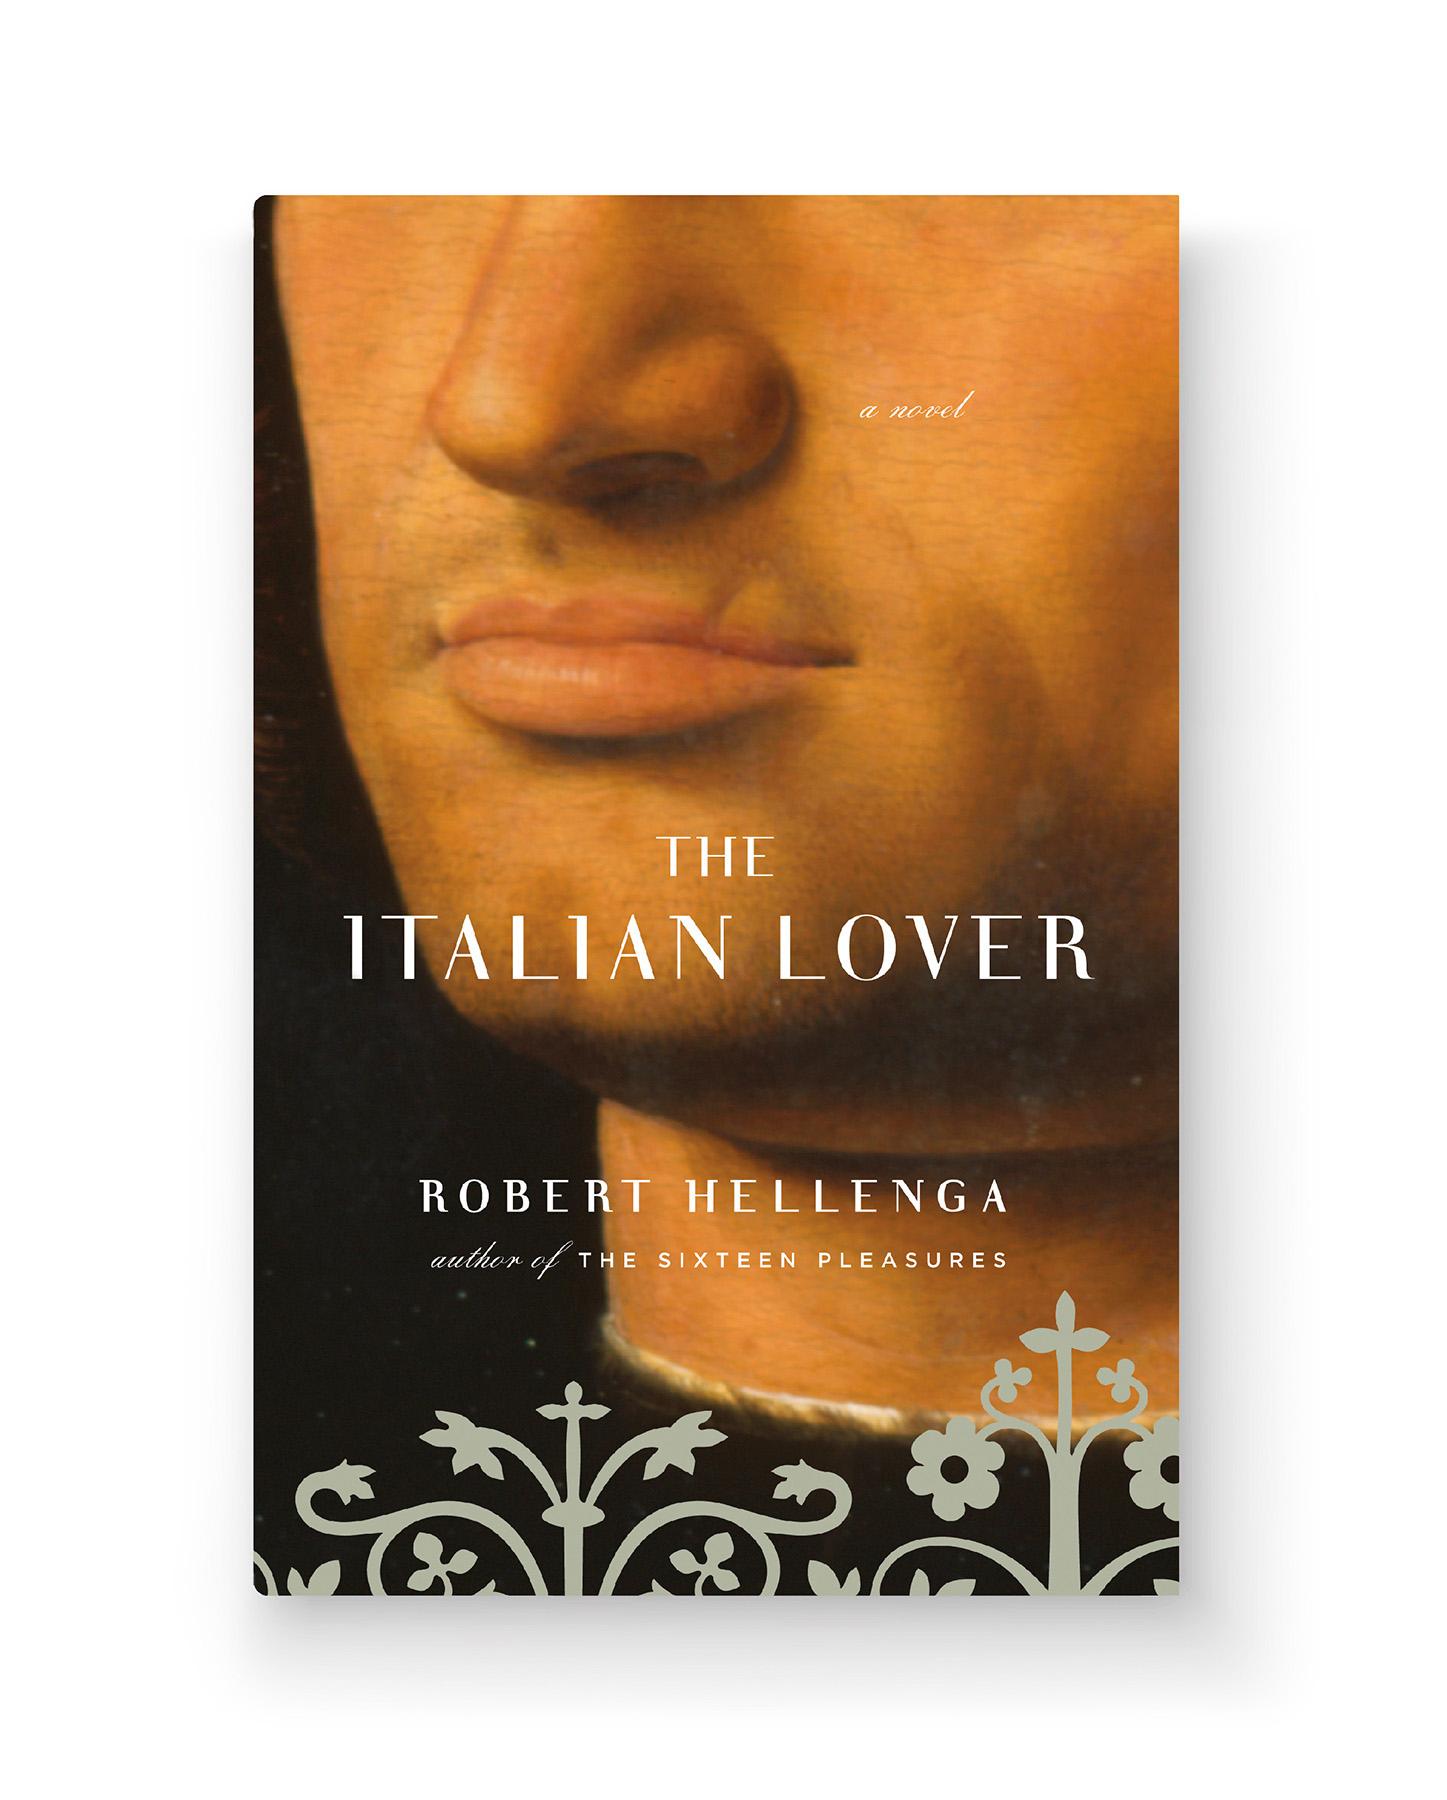 The Italian Lover Book Cover